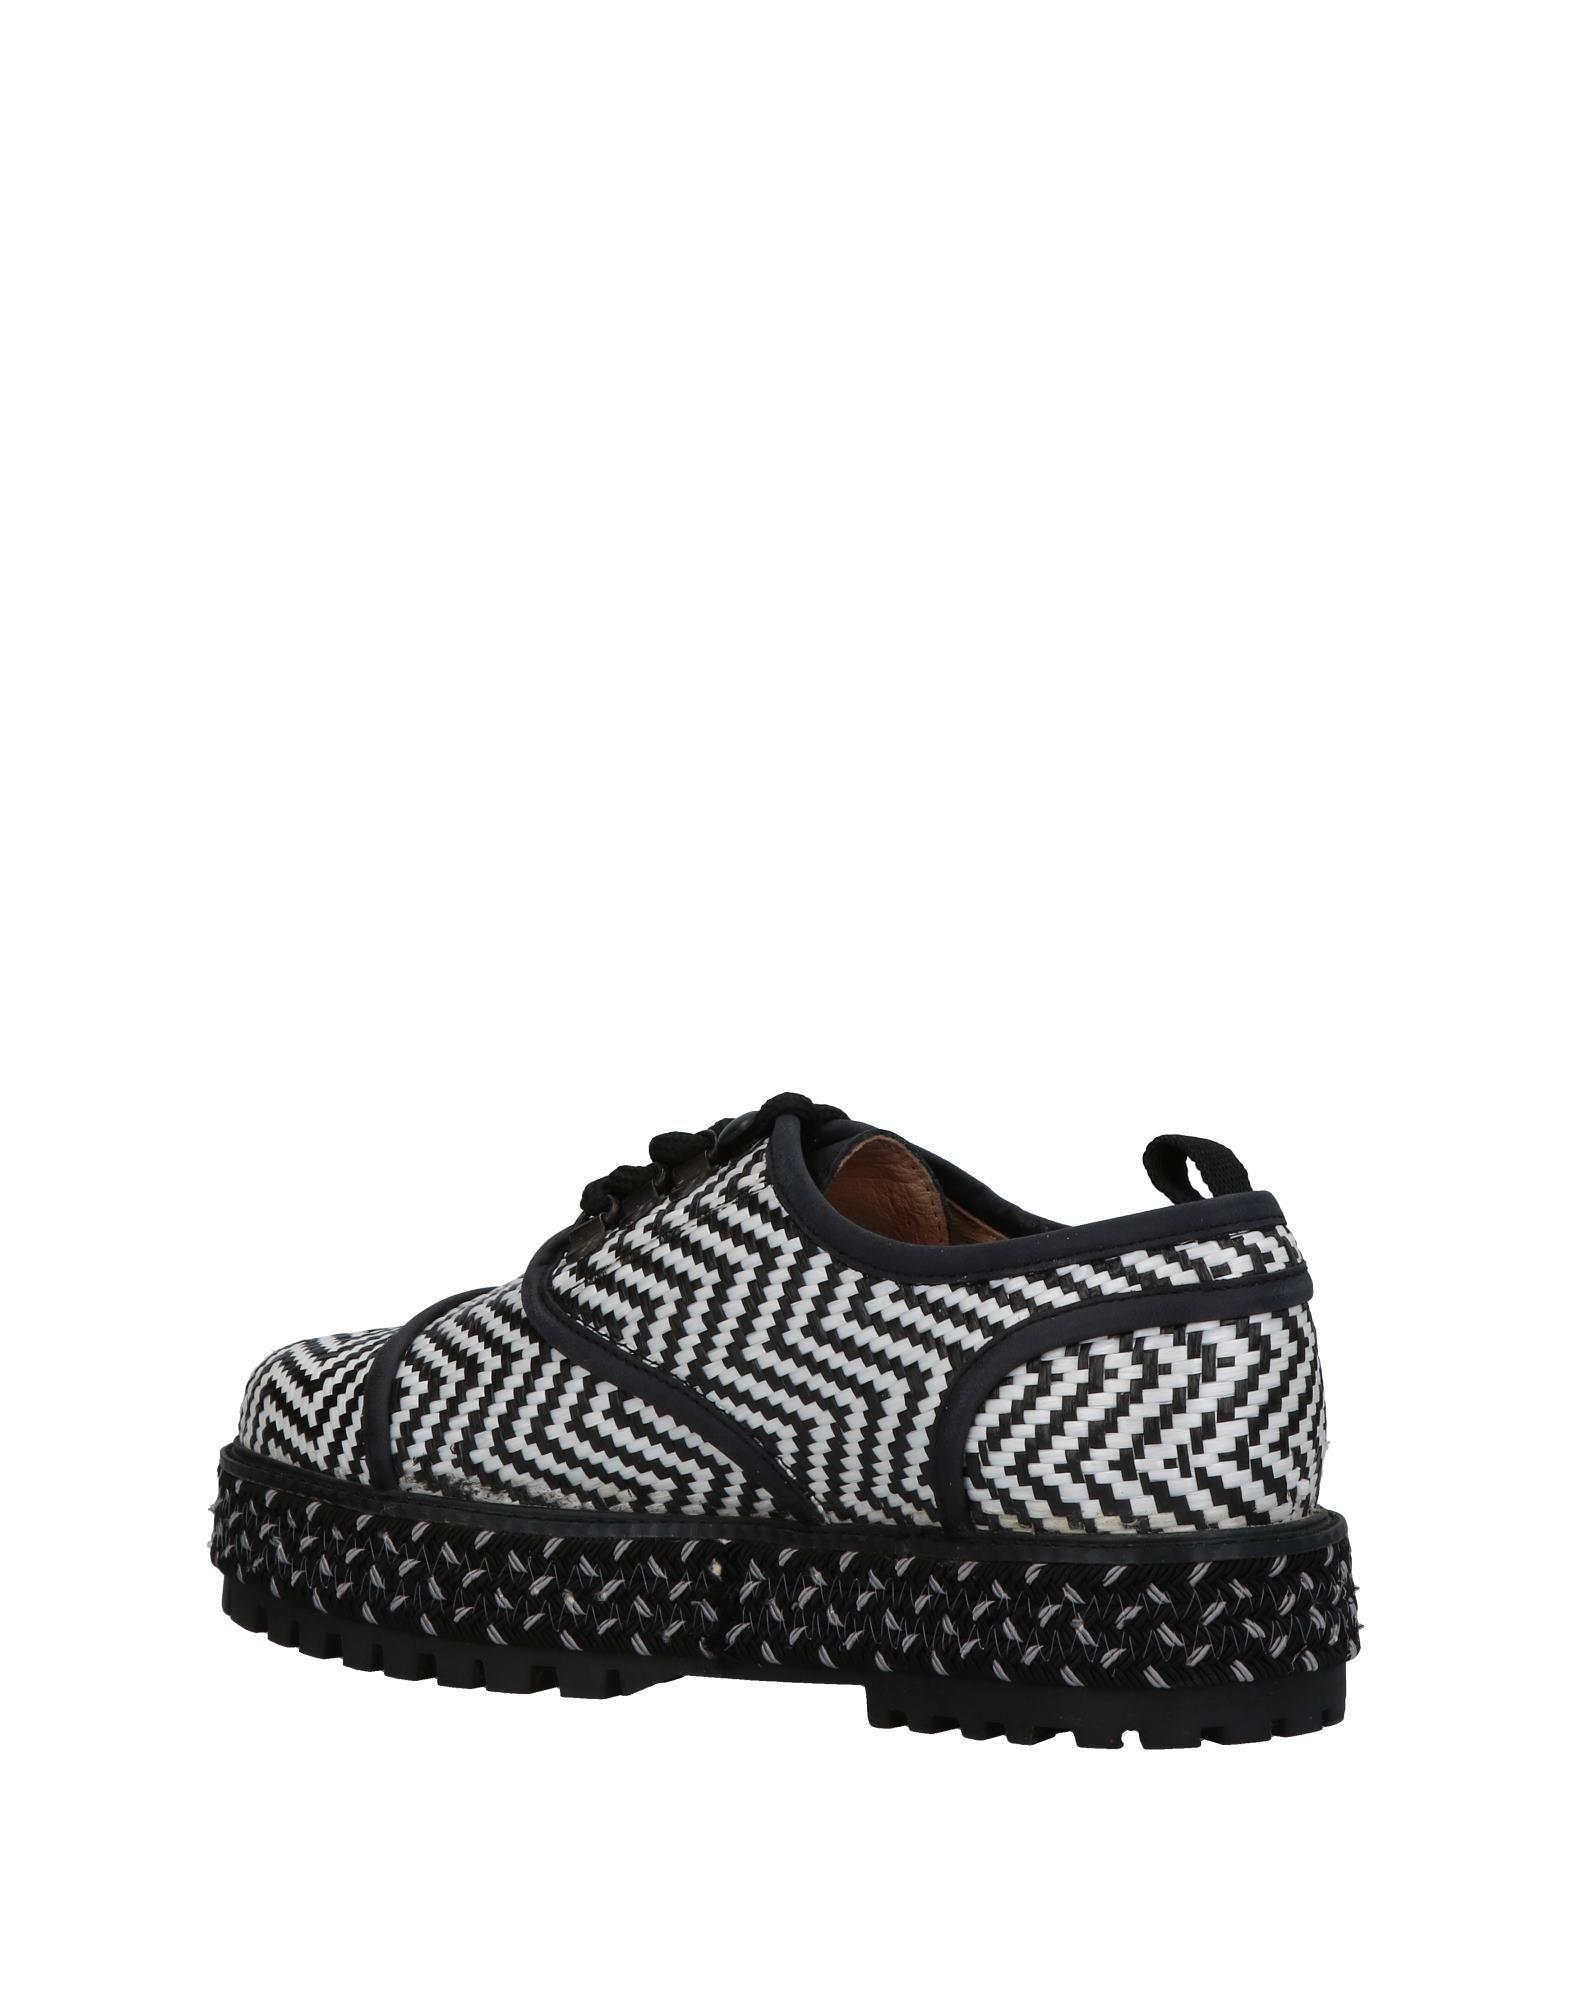 CHAUSSURES - Chaussures à lacetsFarewell Rx0vb9JvdR